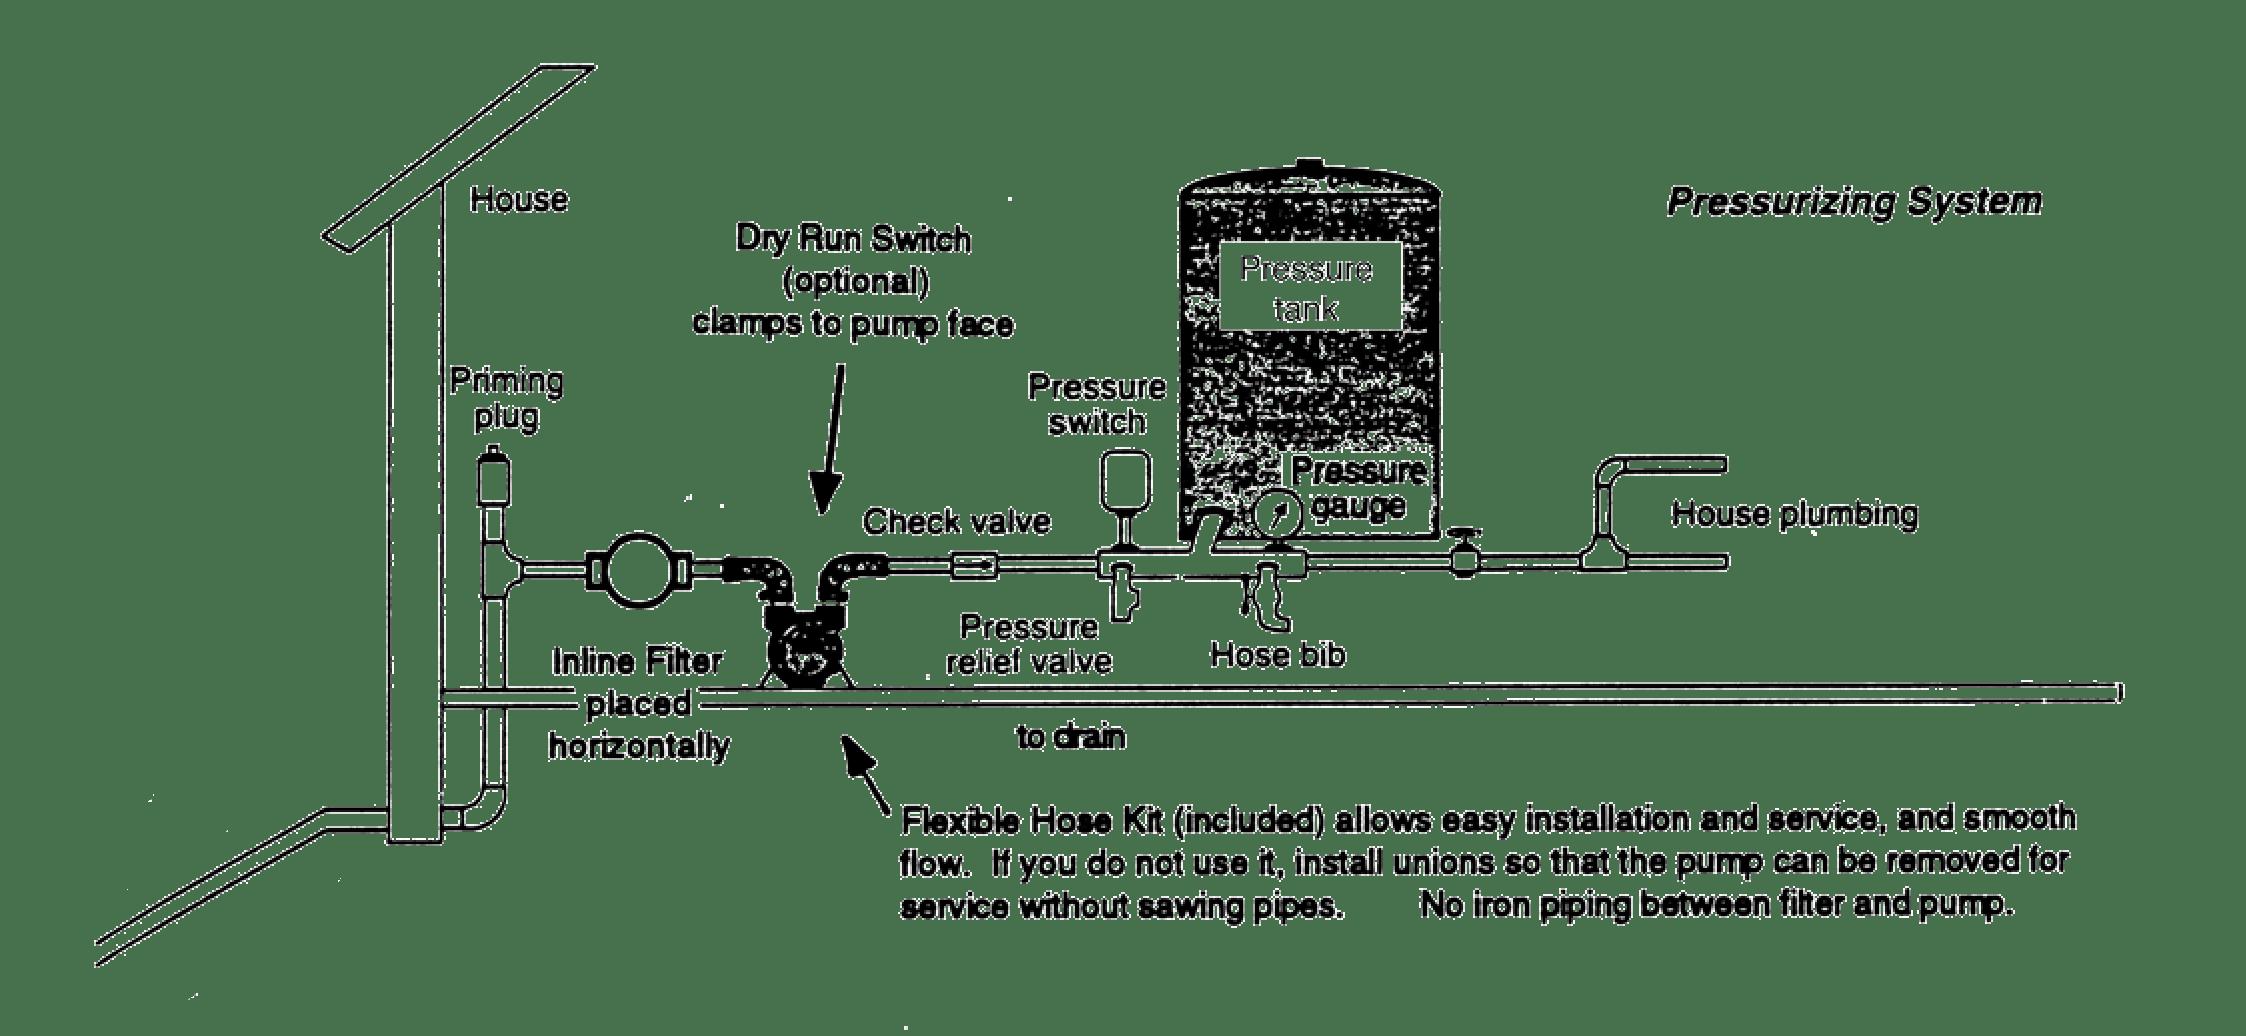 electrical plan symbols fire system